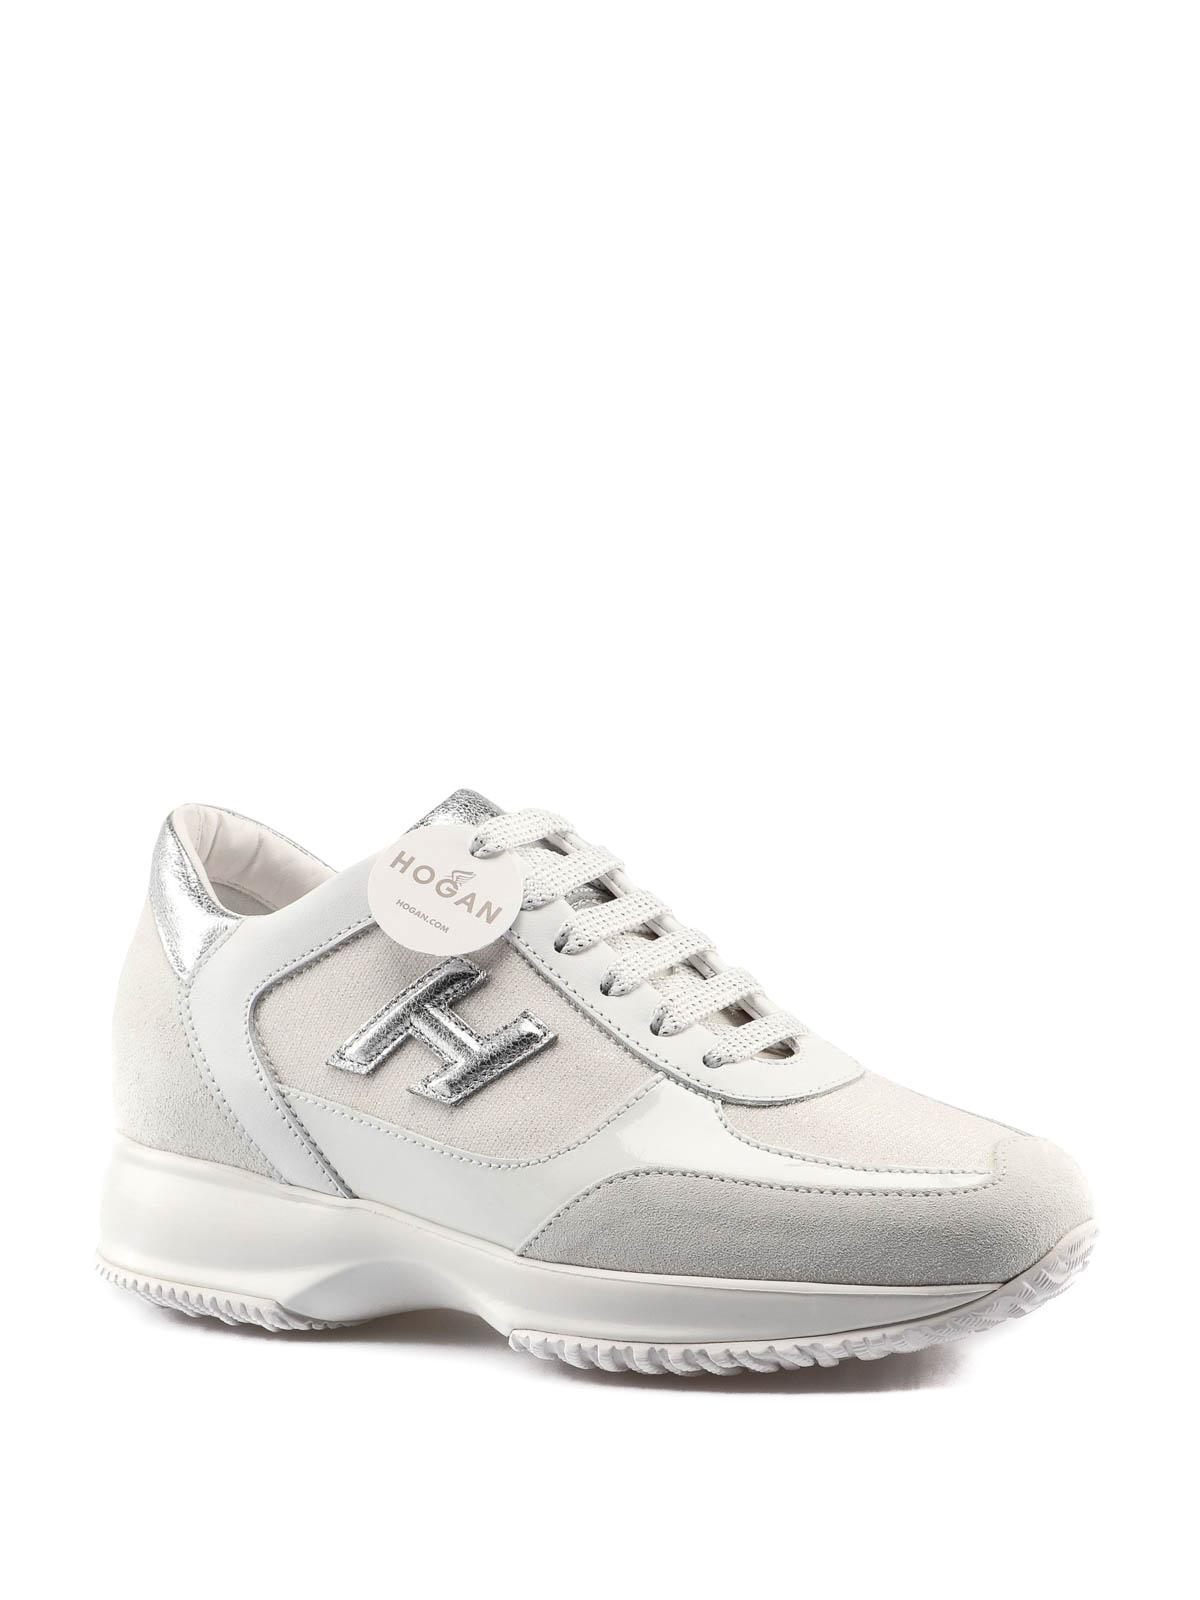 Hogan Suede Interactive H Flock Sneakers in Light Grey (Gray) - Lyst